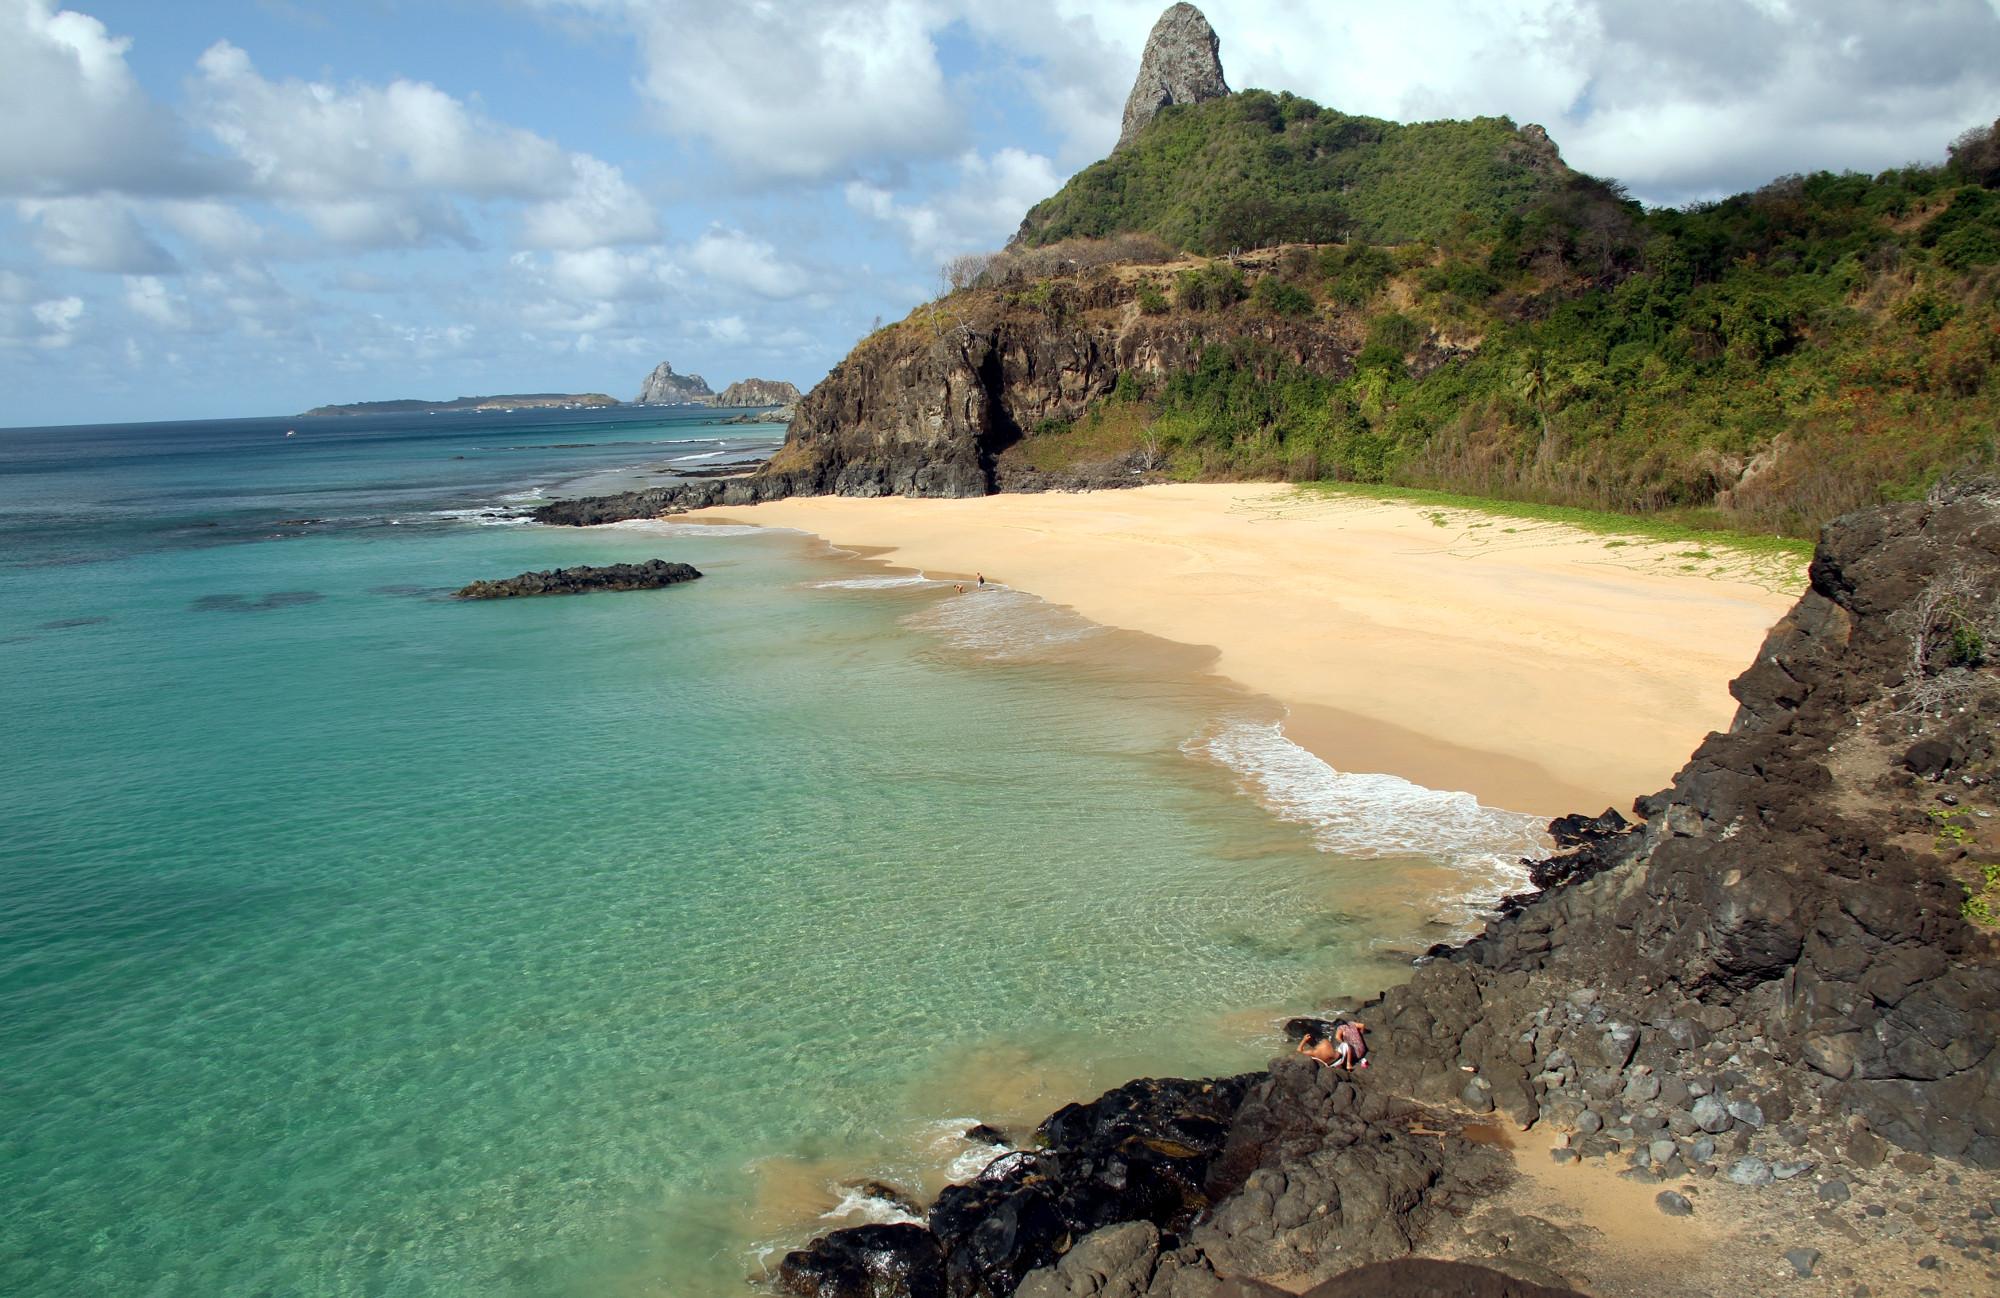 Mirante da Praia do Americano (foto: Eduardo Vessoni)